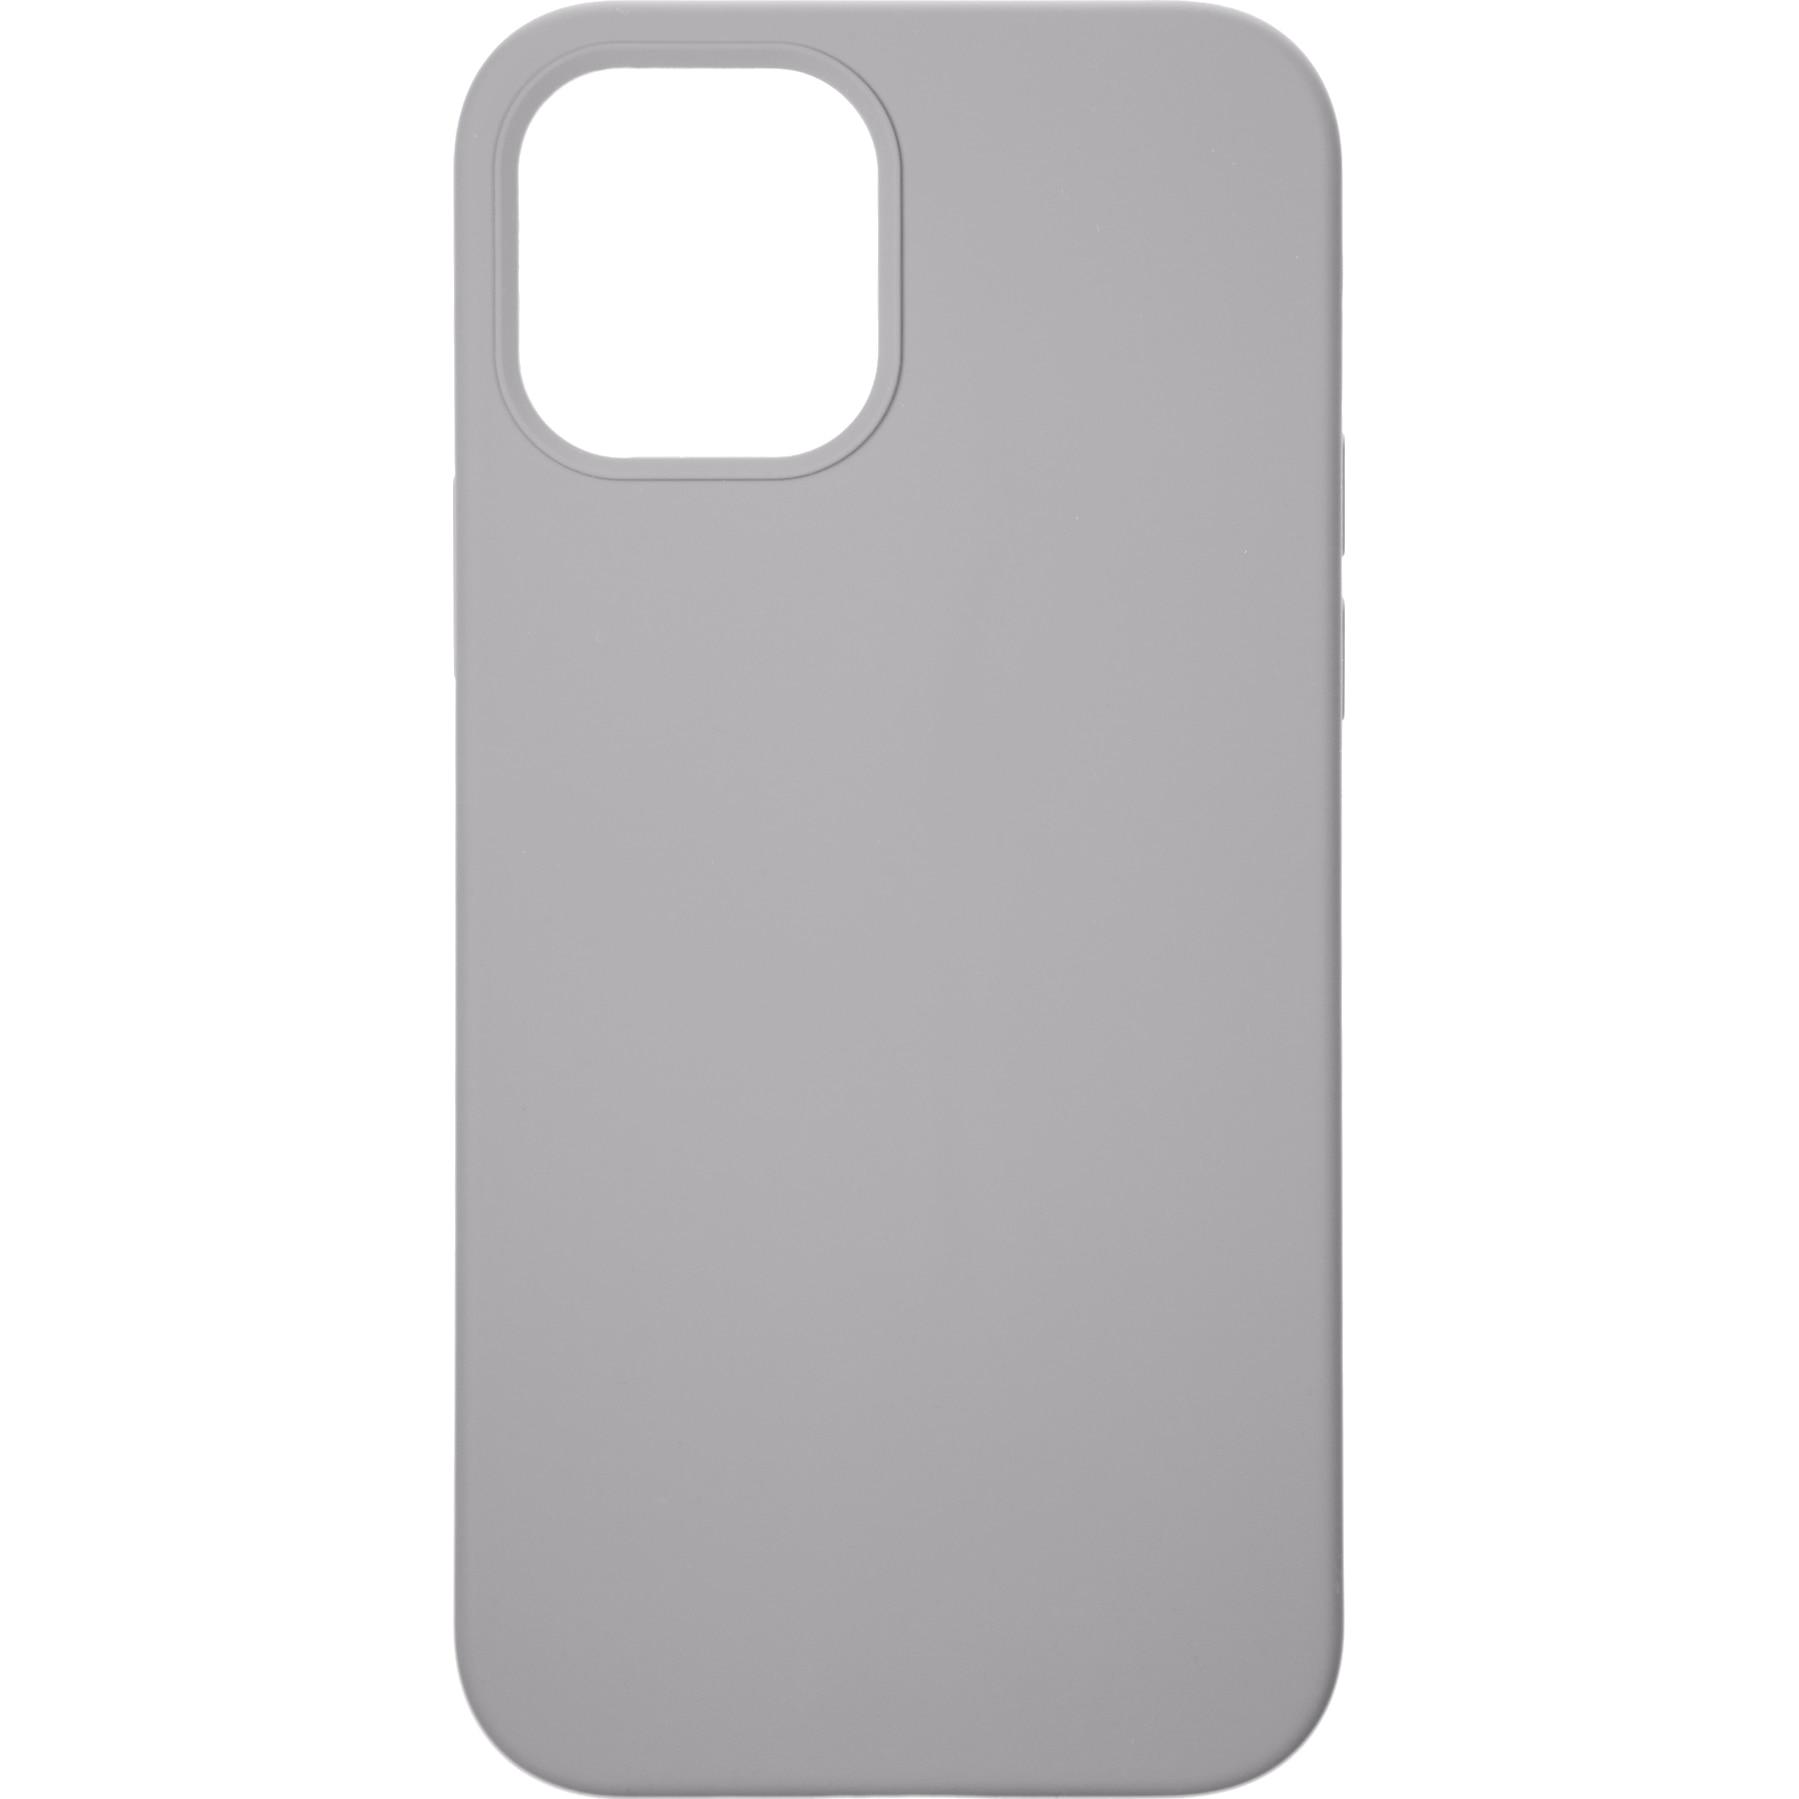 Fotografie Husa de protectie Tactical Velvet Smoothie pentru iPhone 12/12 Pro Foggy